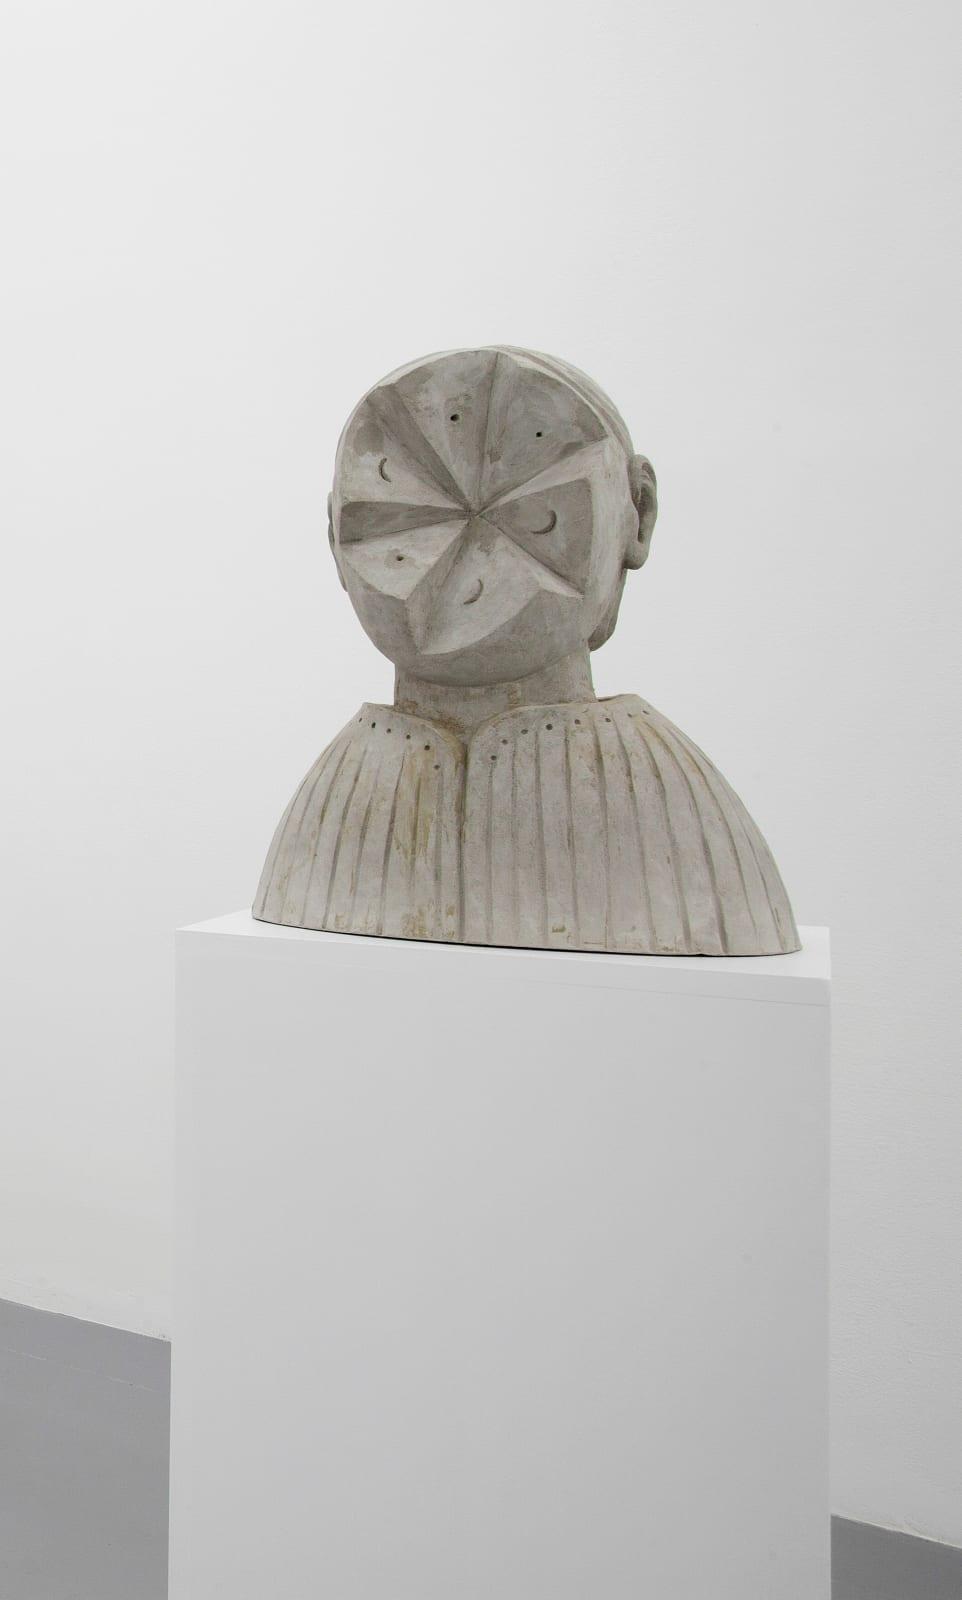 Anna Hulacova, Untitled, 2017, cement 43 x 35 x 22 cm